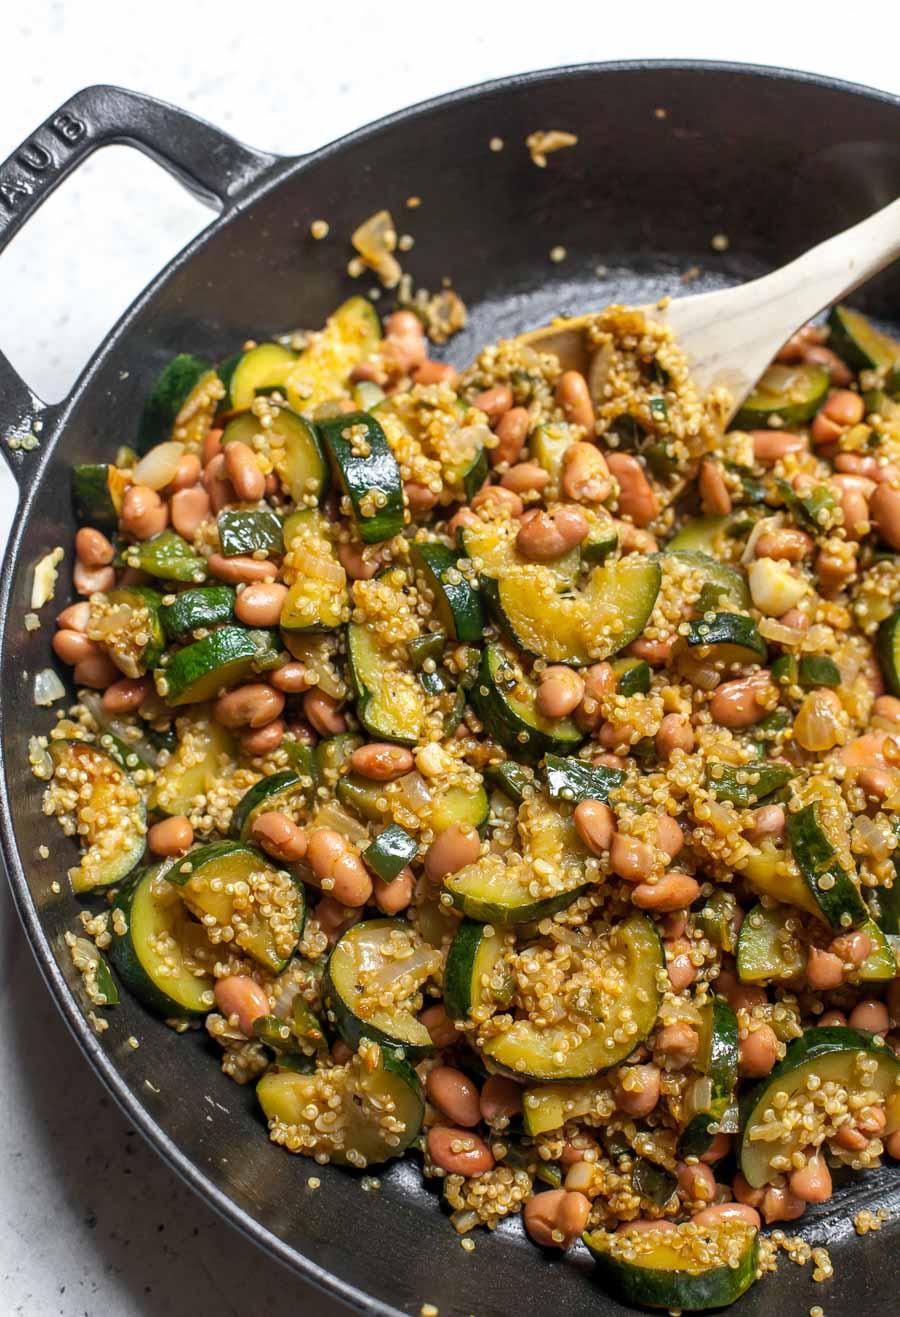 Sautéed vegetables, quinoa, and pinto beans